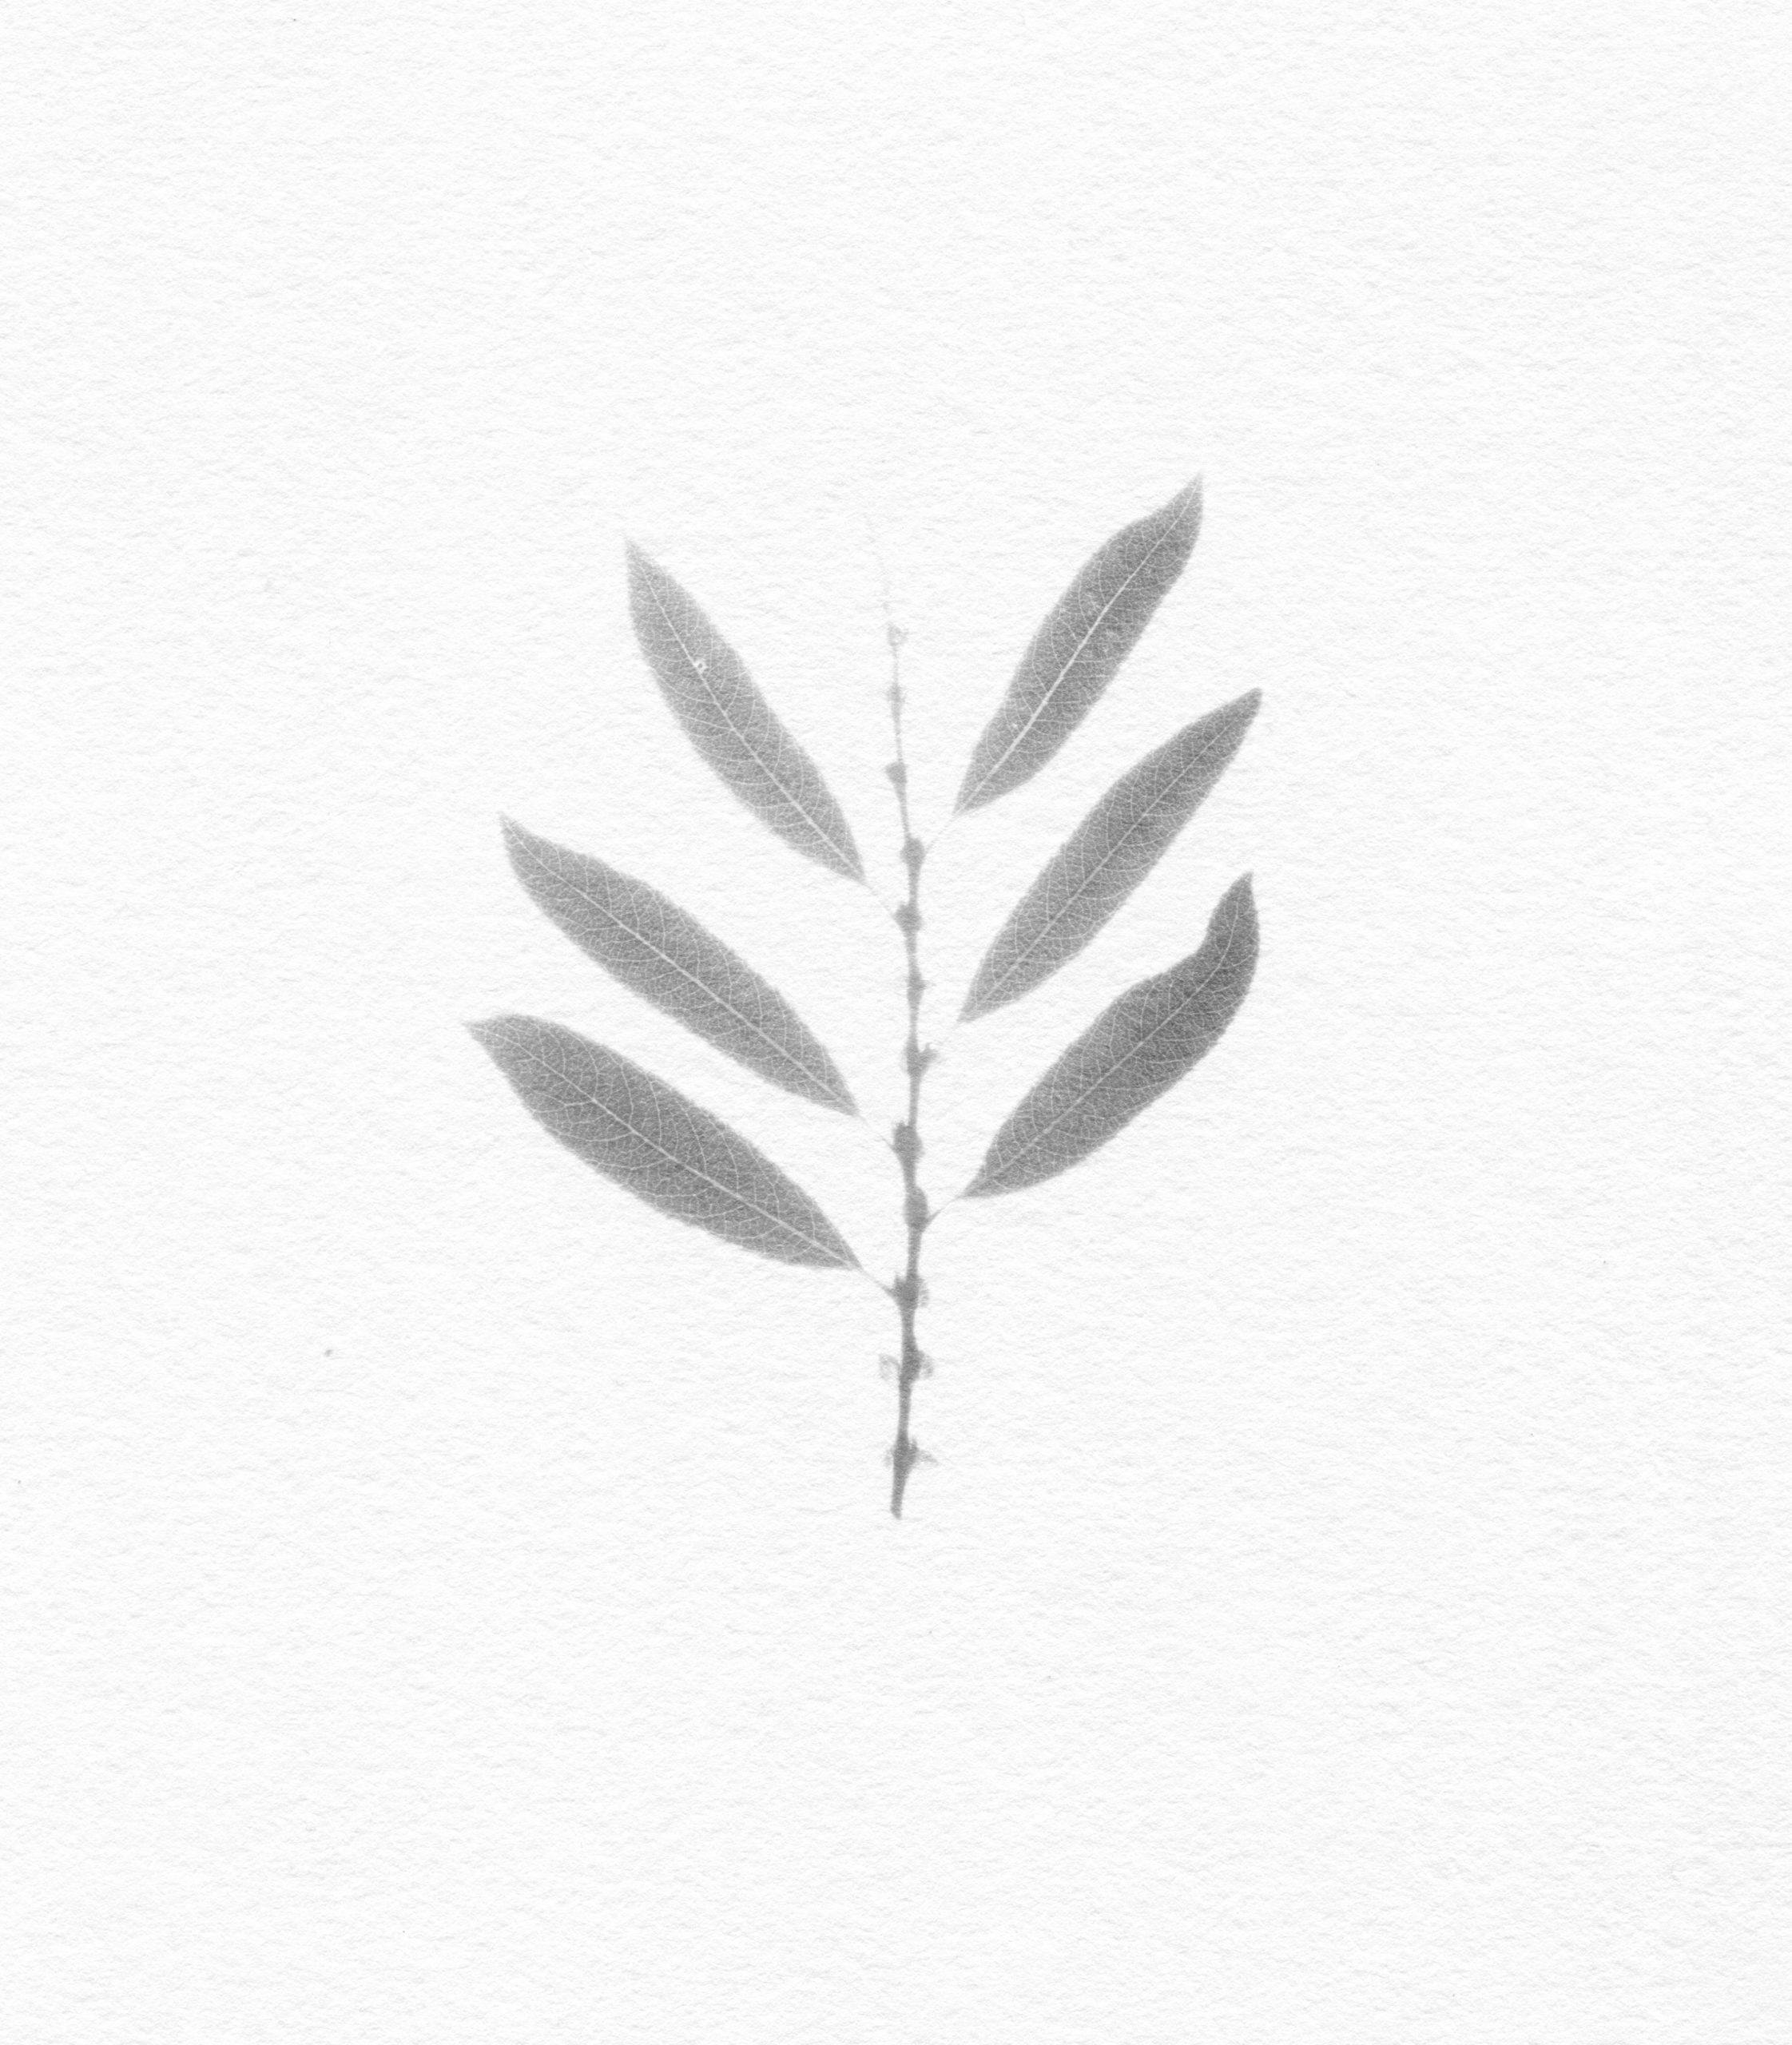 Nicholas Fisher, Salix triandra (Almond Willow)